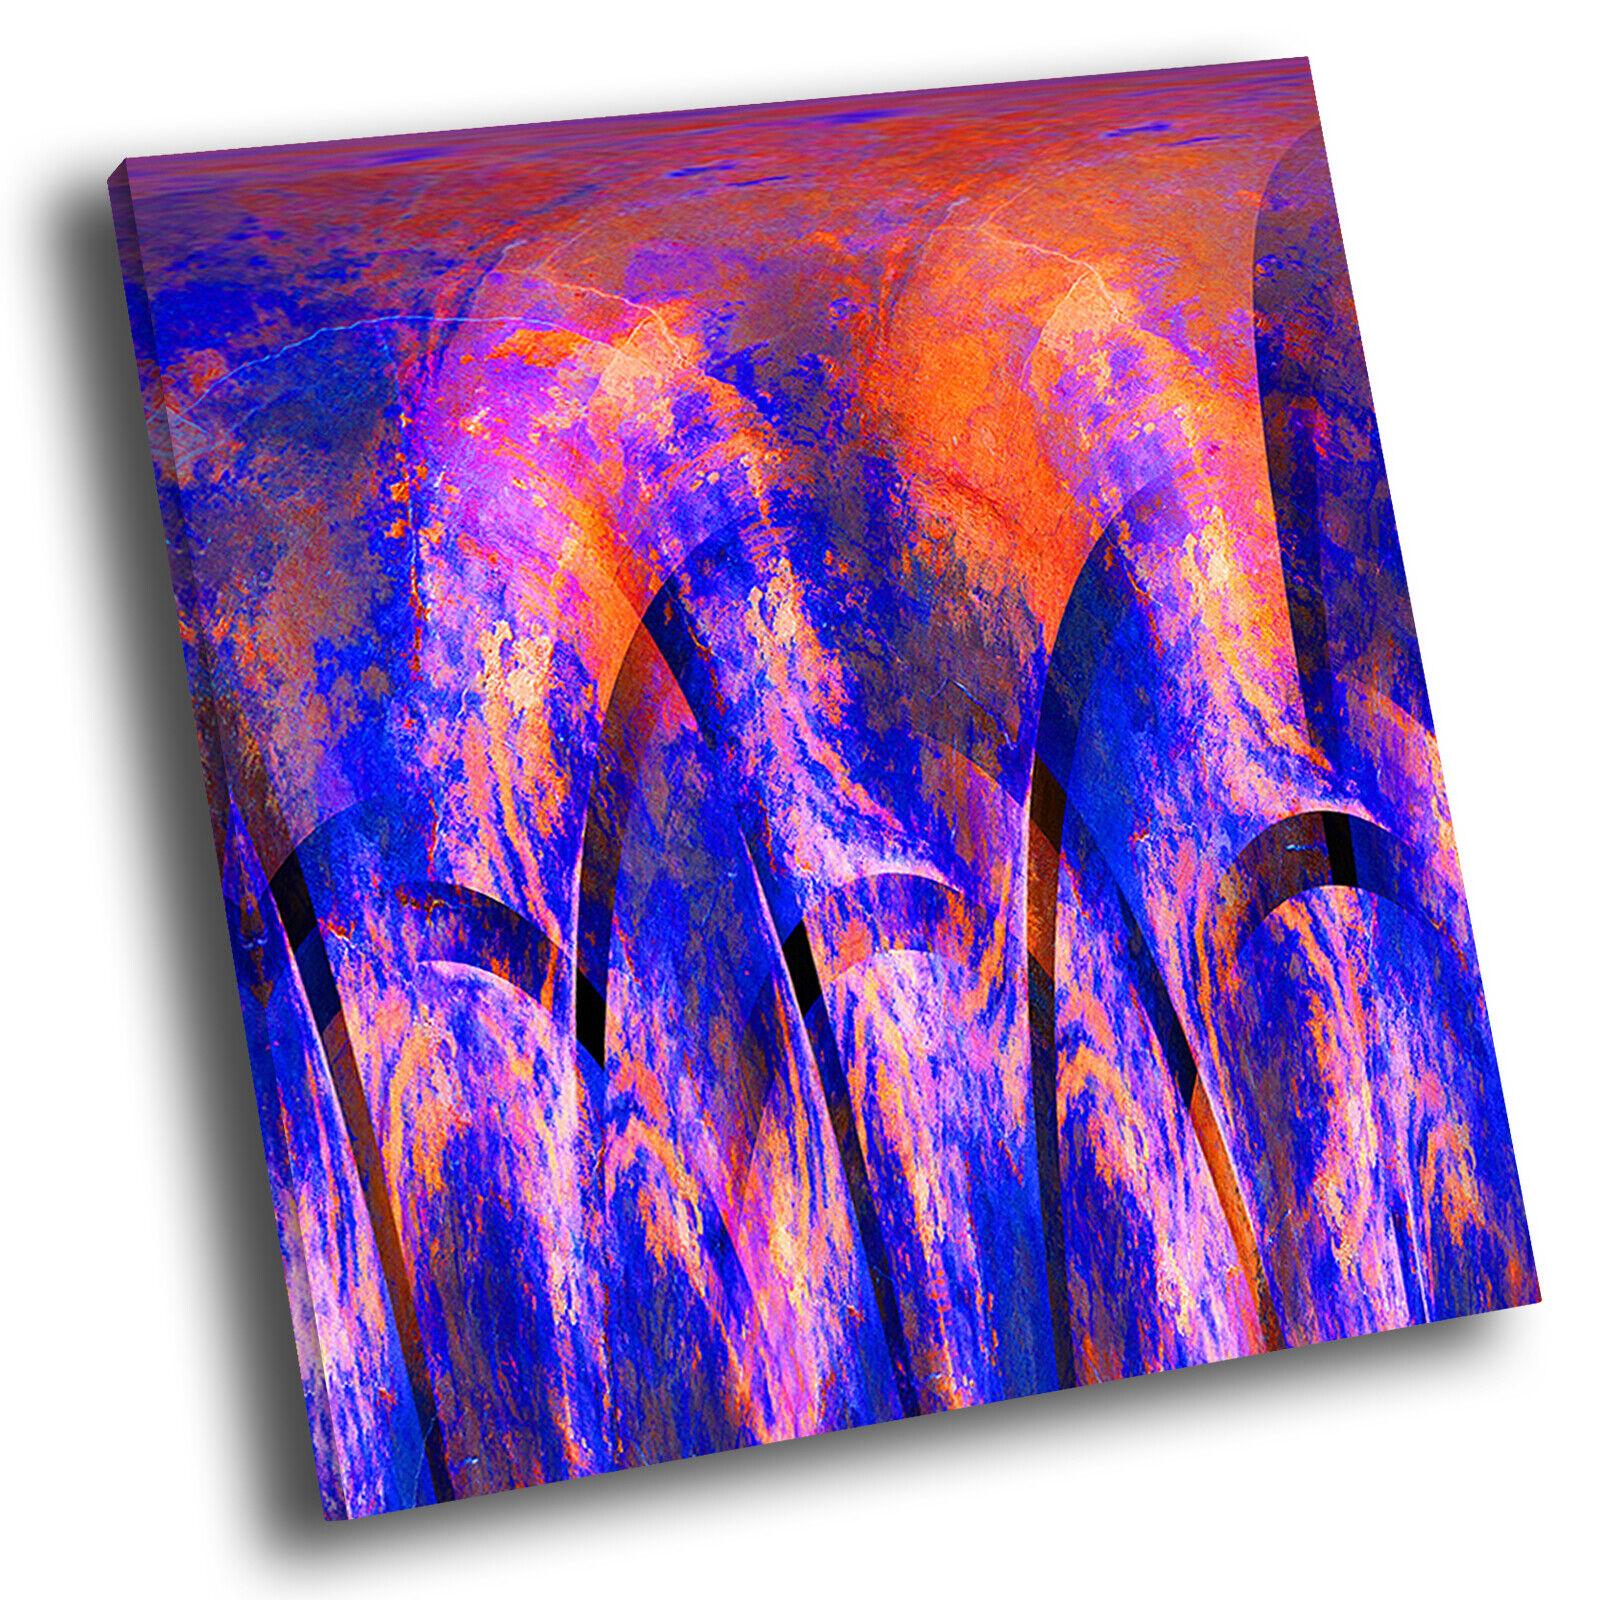 Retro Blau Orange  Square Abstract Photo Canvas Wall Art Large Picture Prints